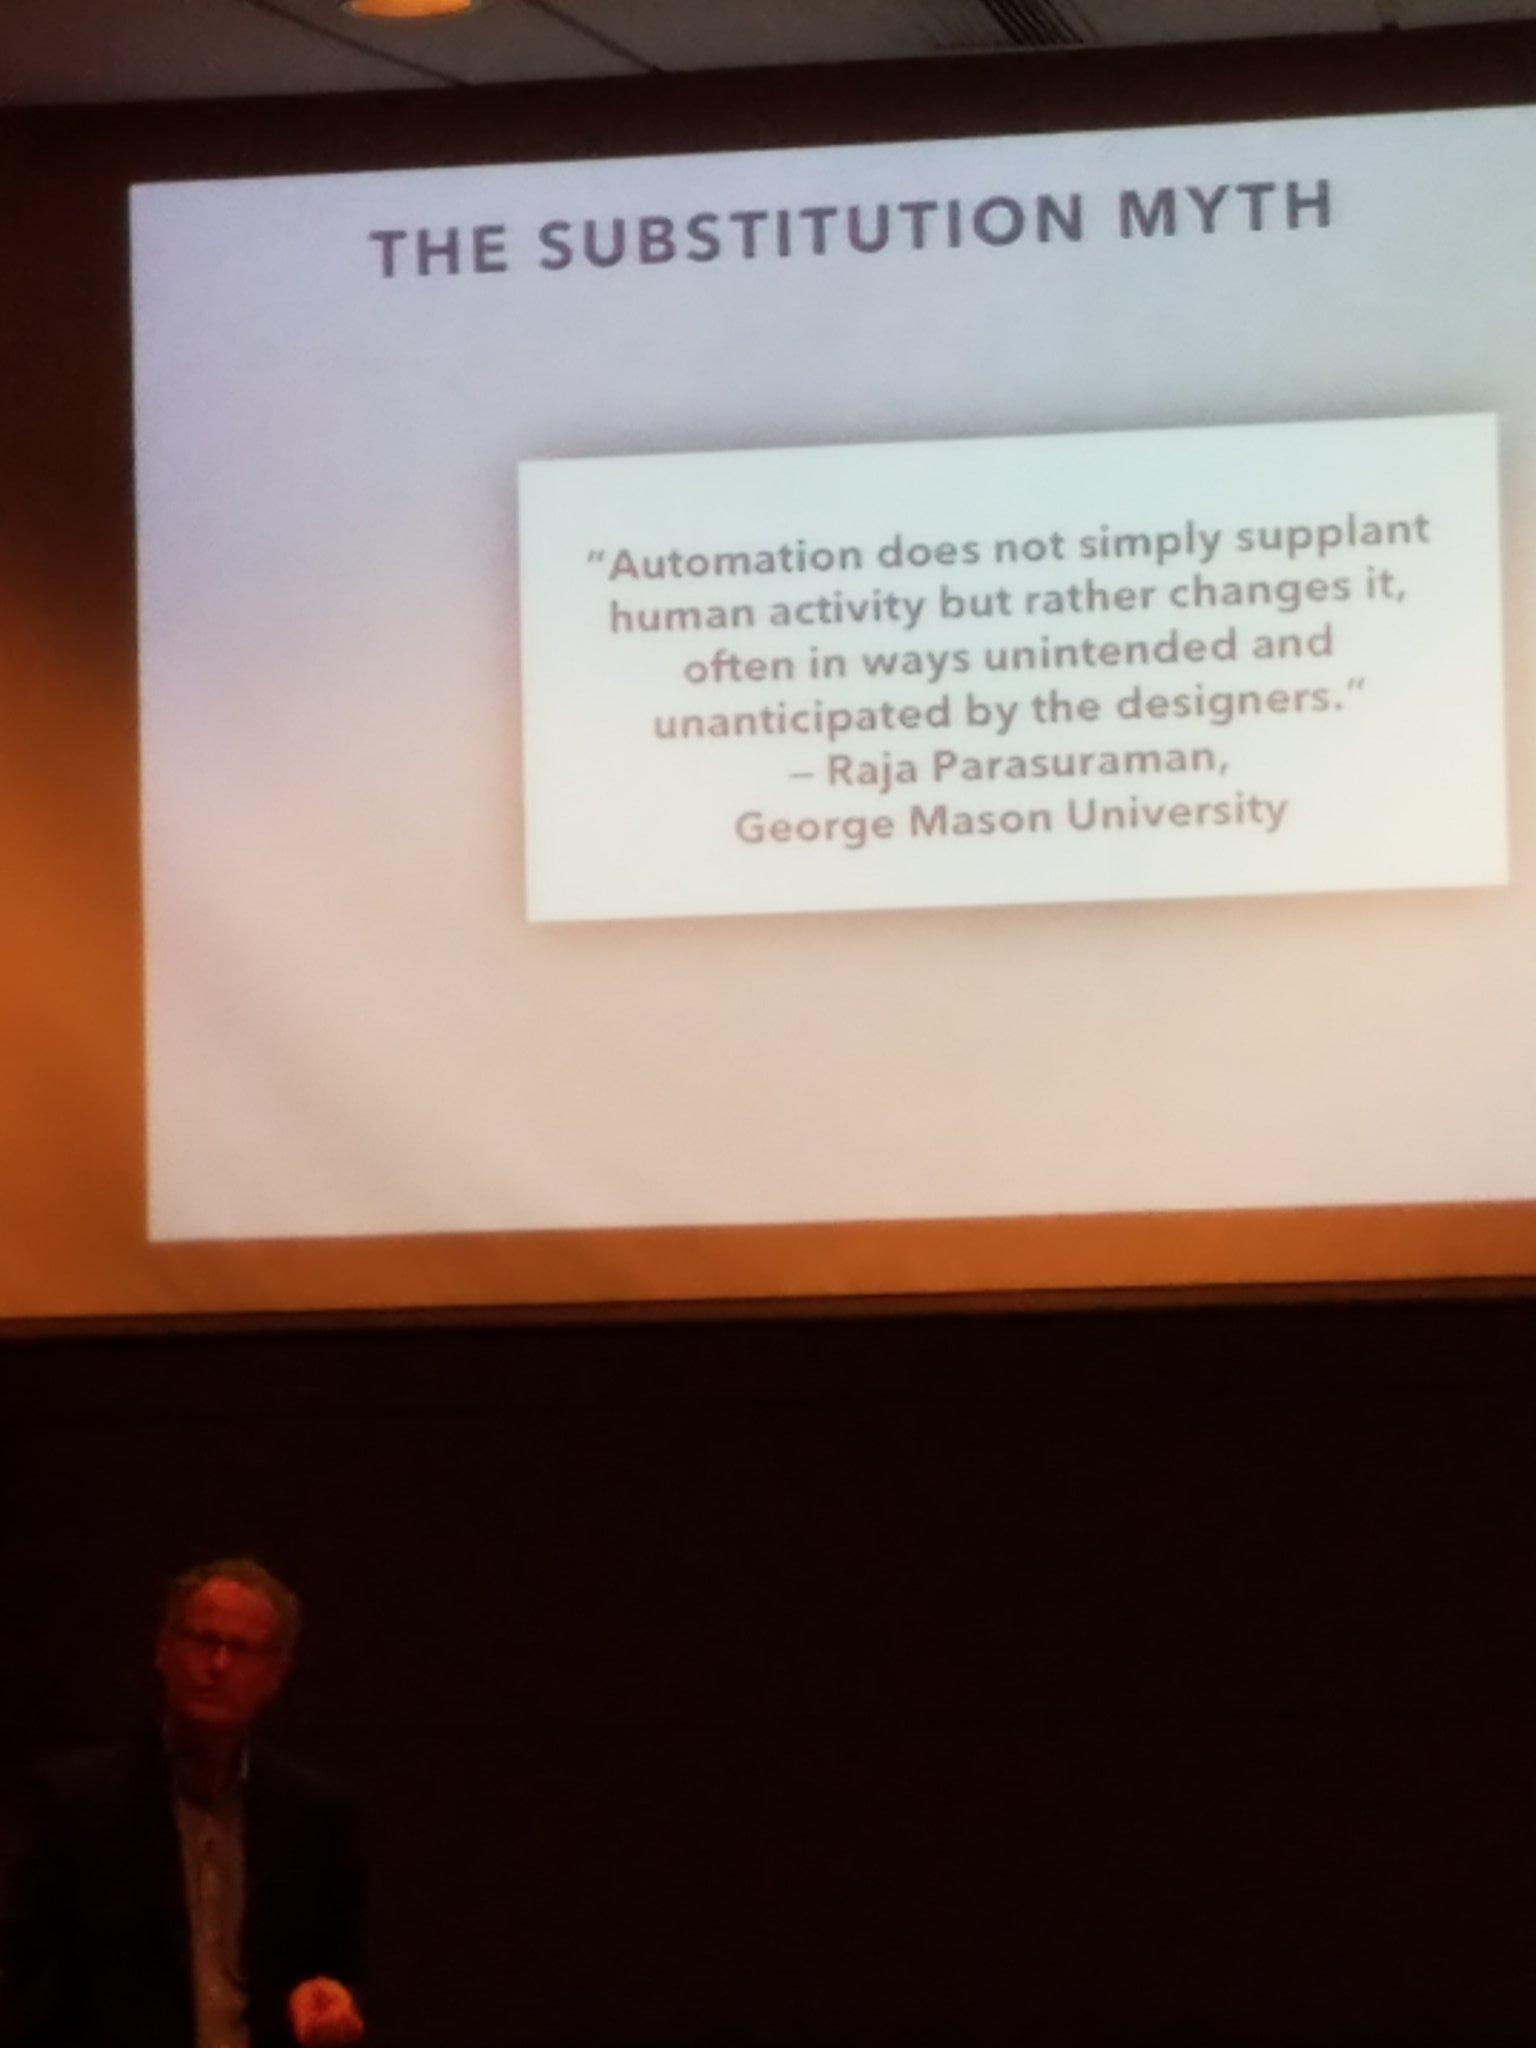 Substitution myth #NicholasCarr #CAST2016 https://t.co/B2LRECUlQg